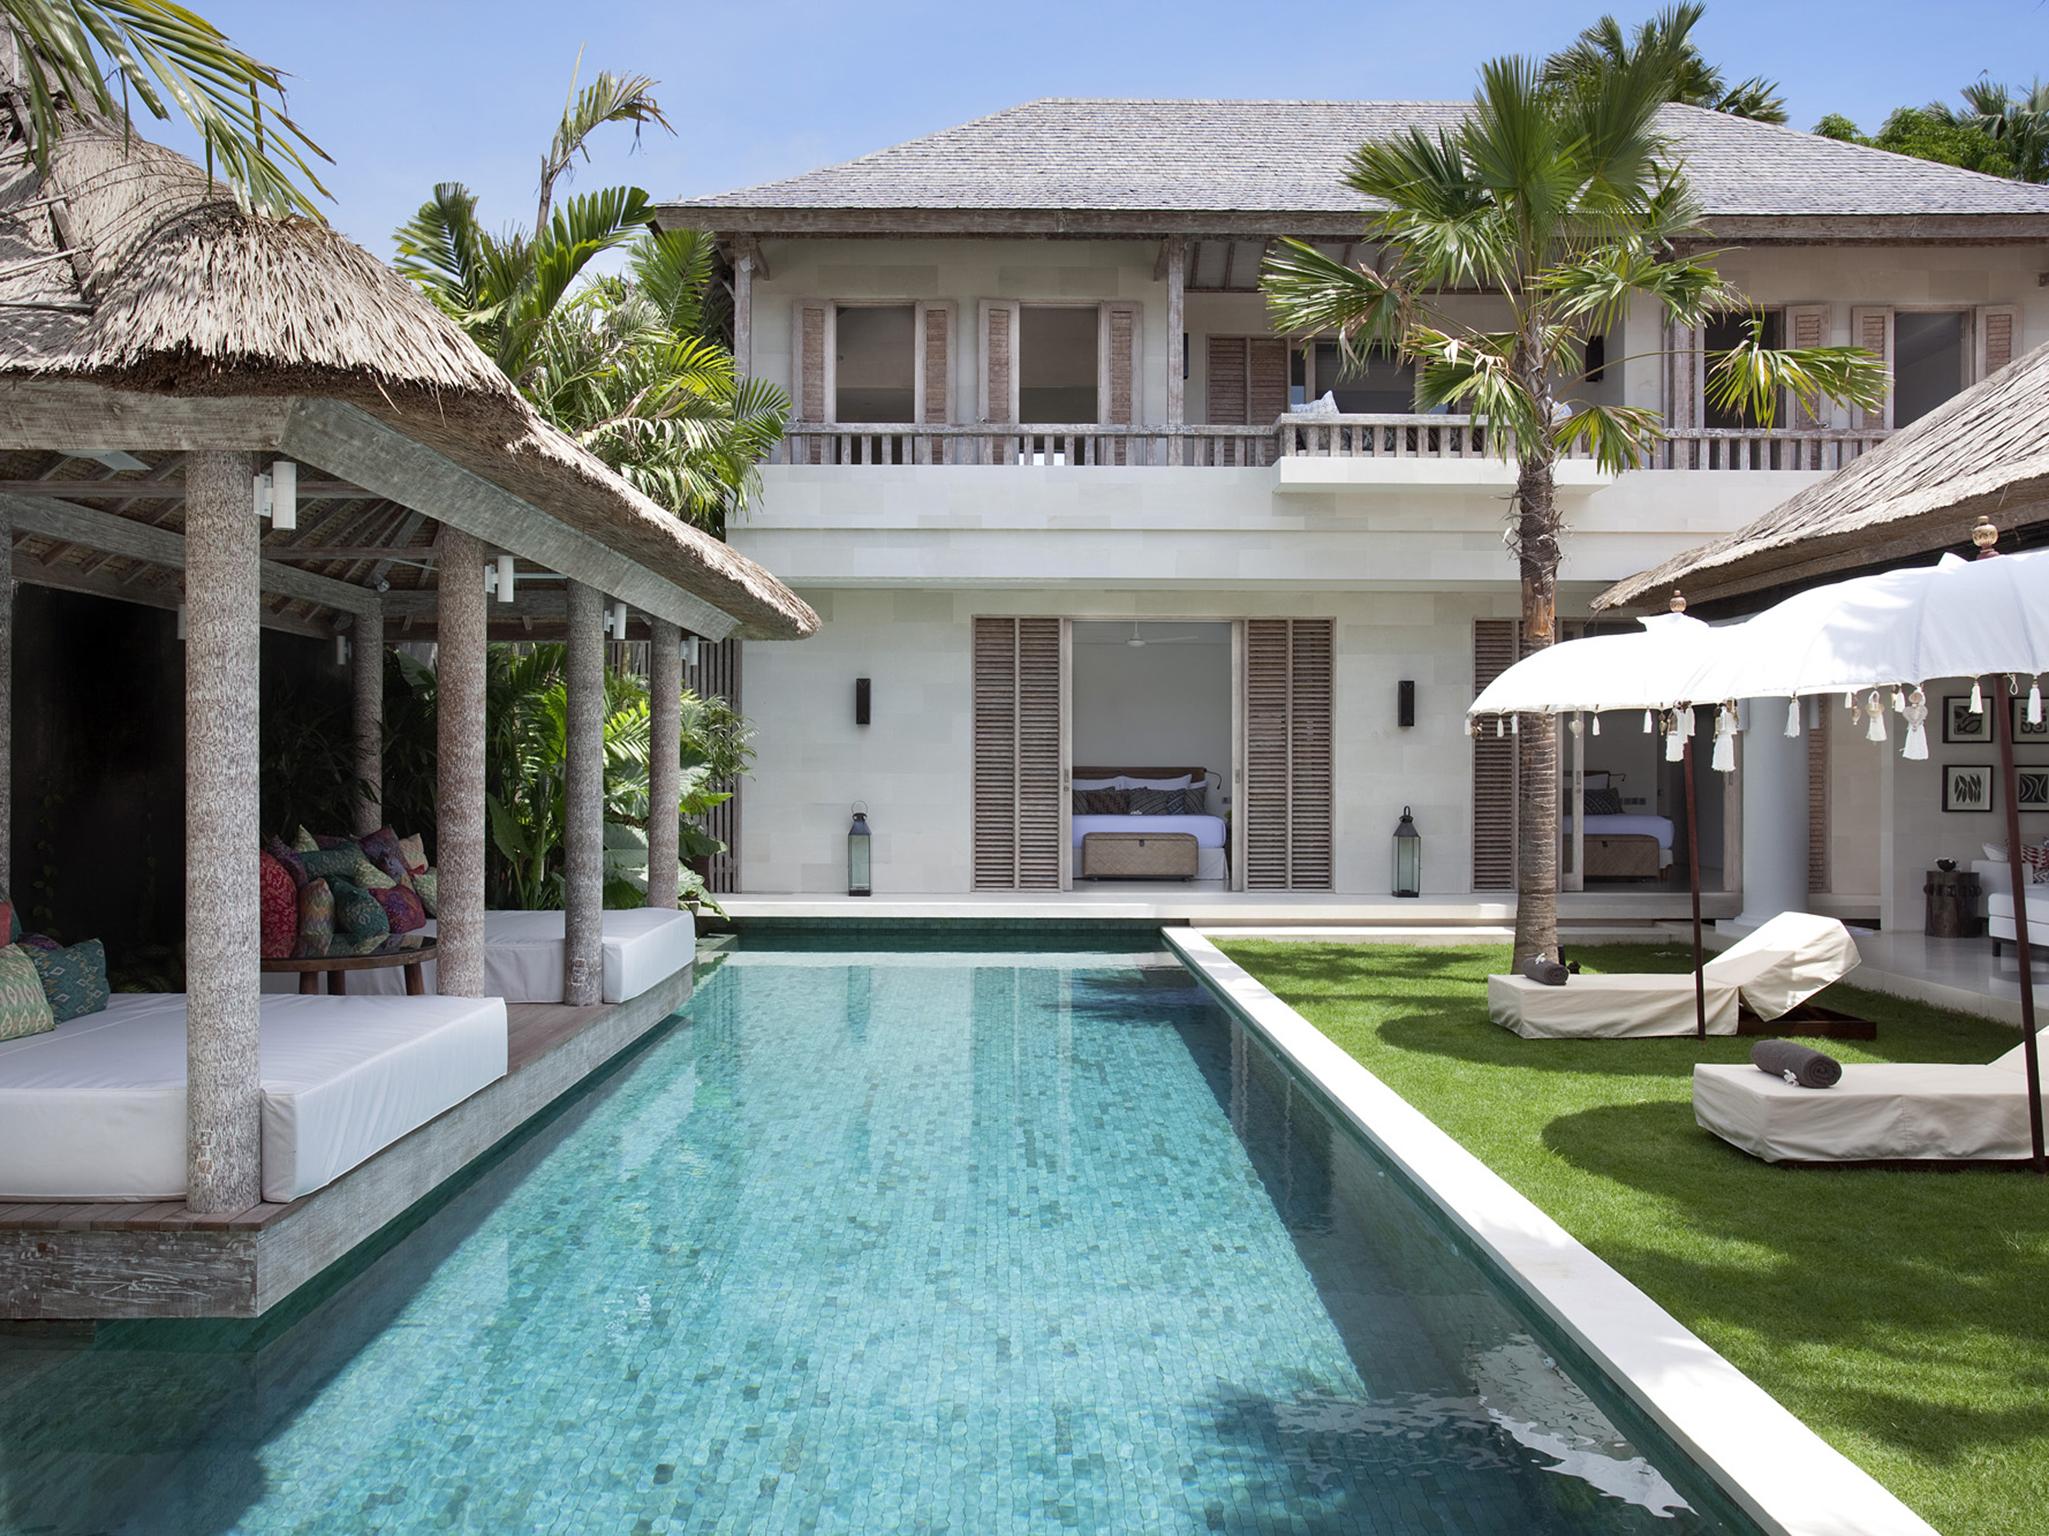 VilLA adasa - Bali